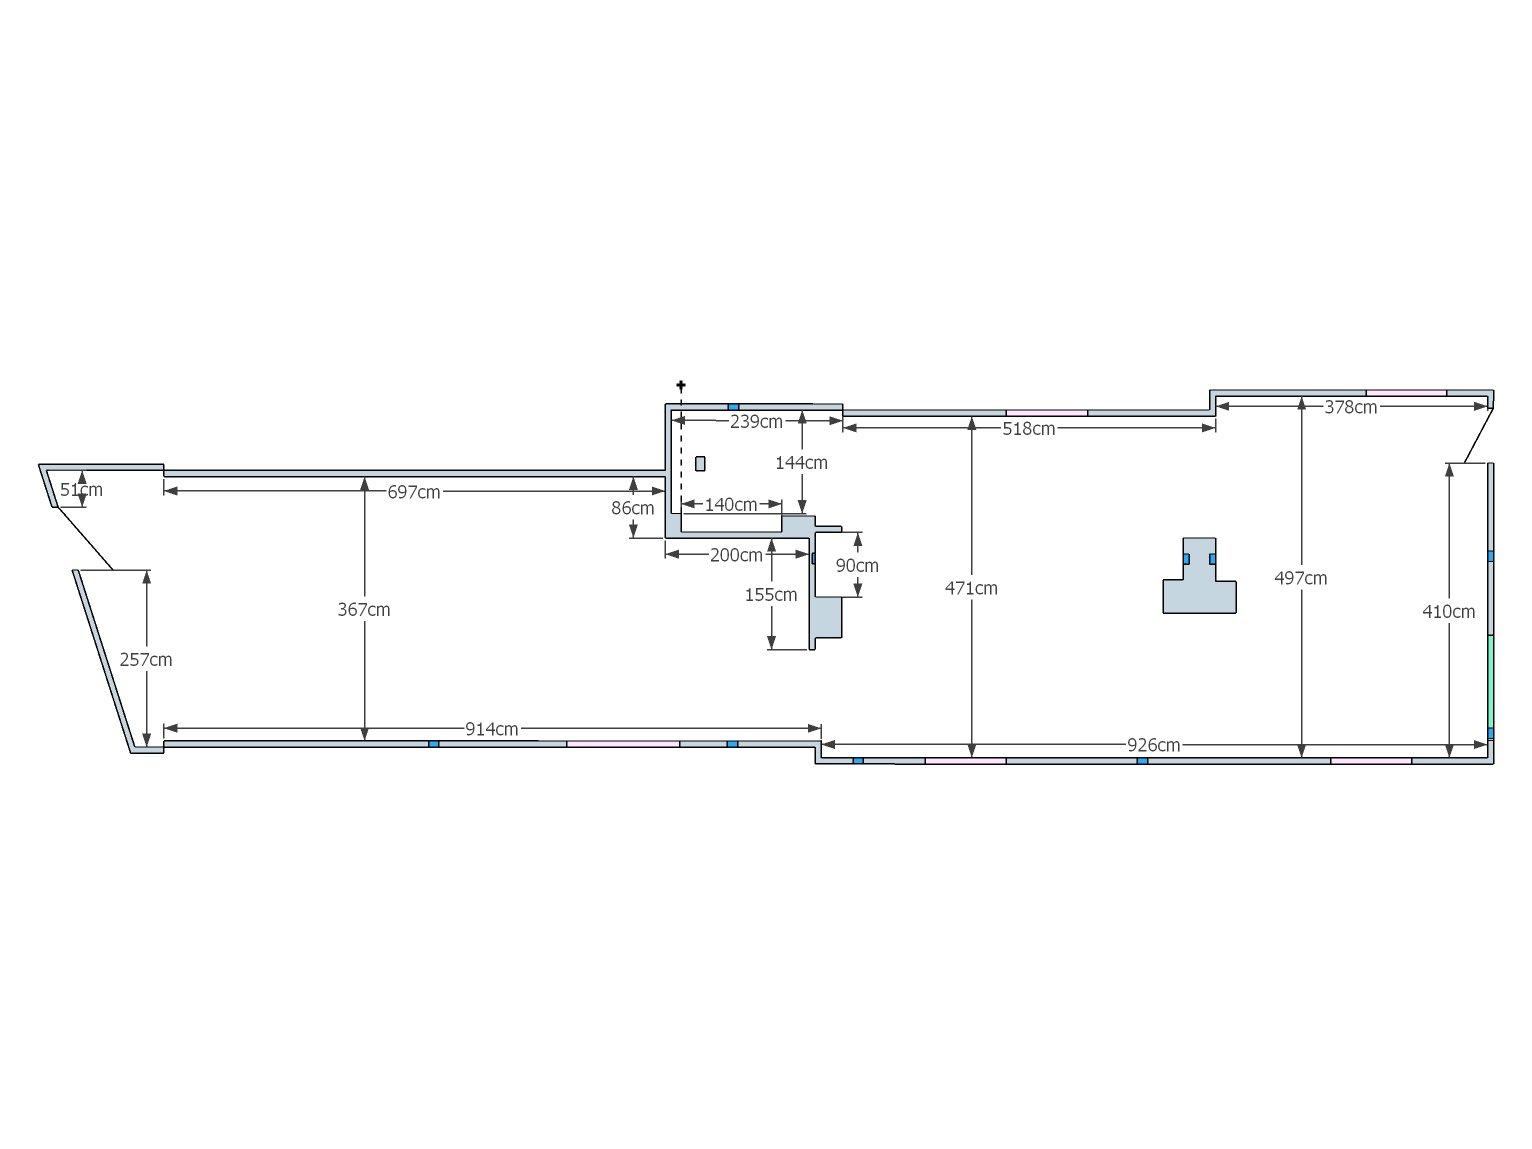 Offshoot Floorplan.jpg